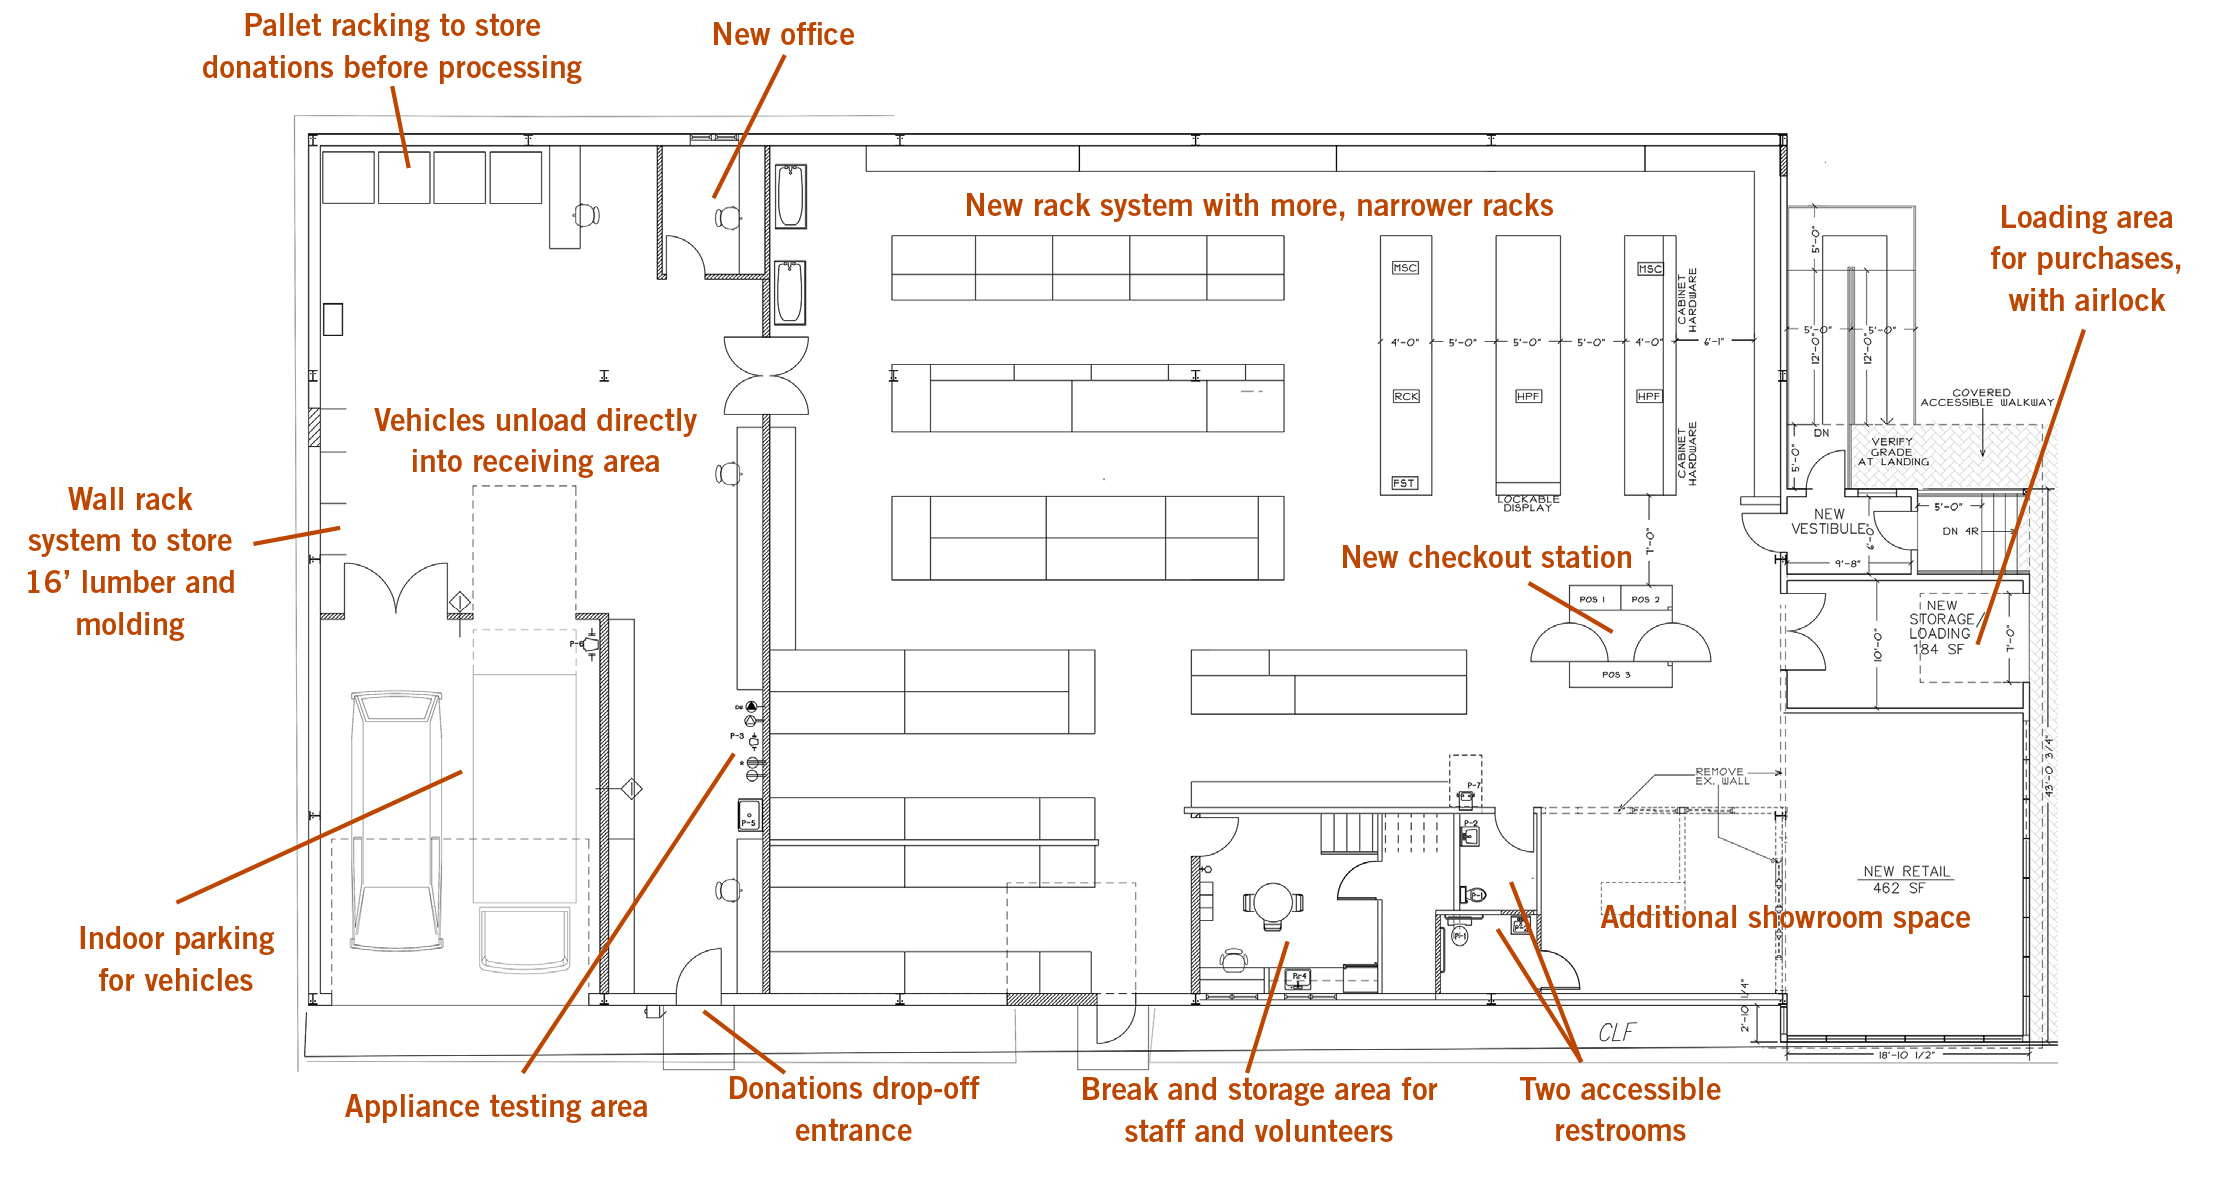 floor plan w labels.jpg